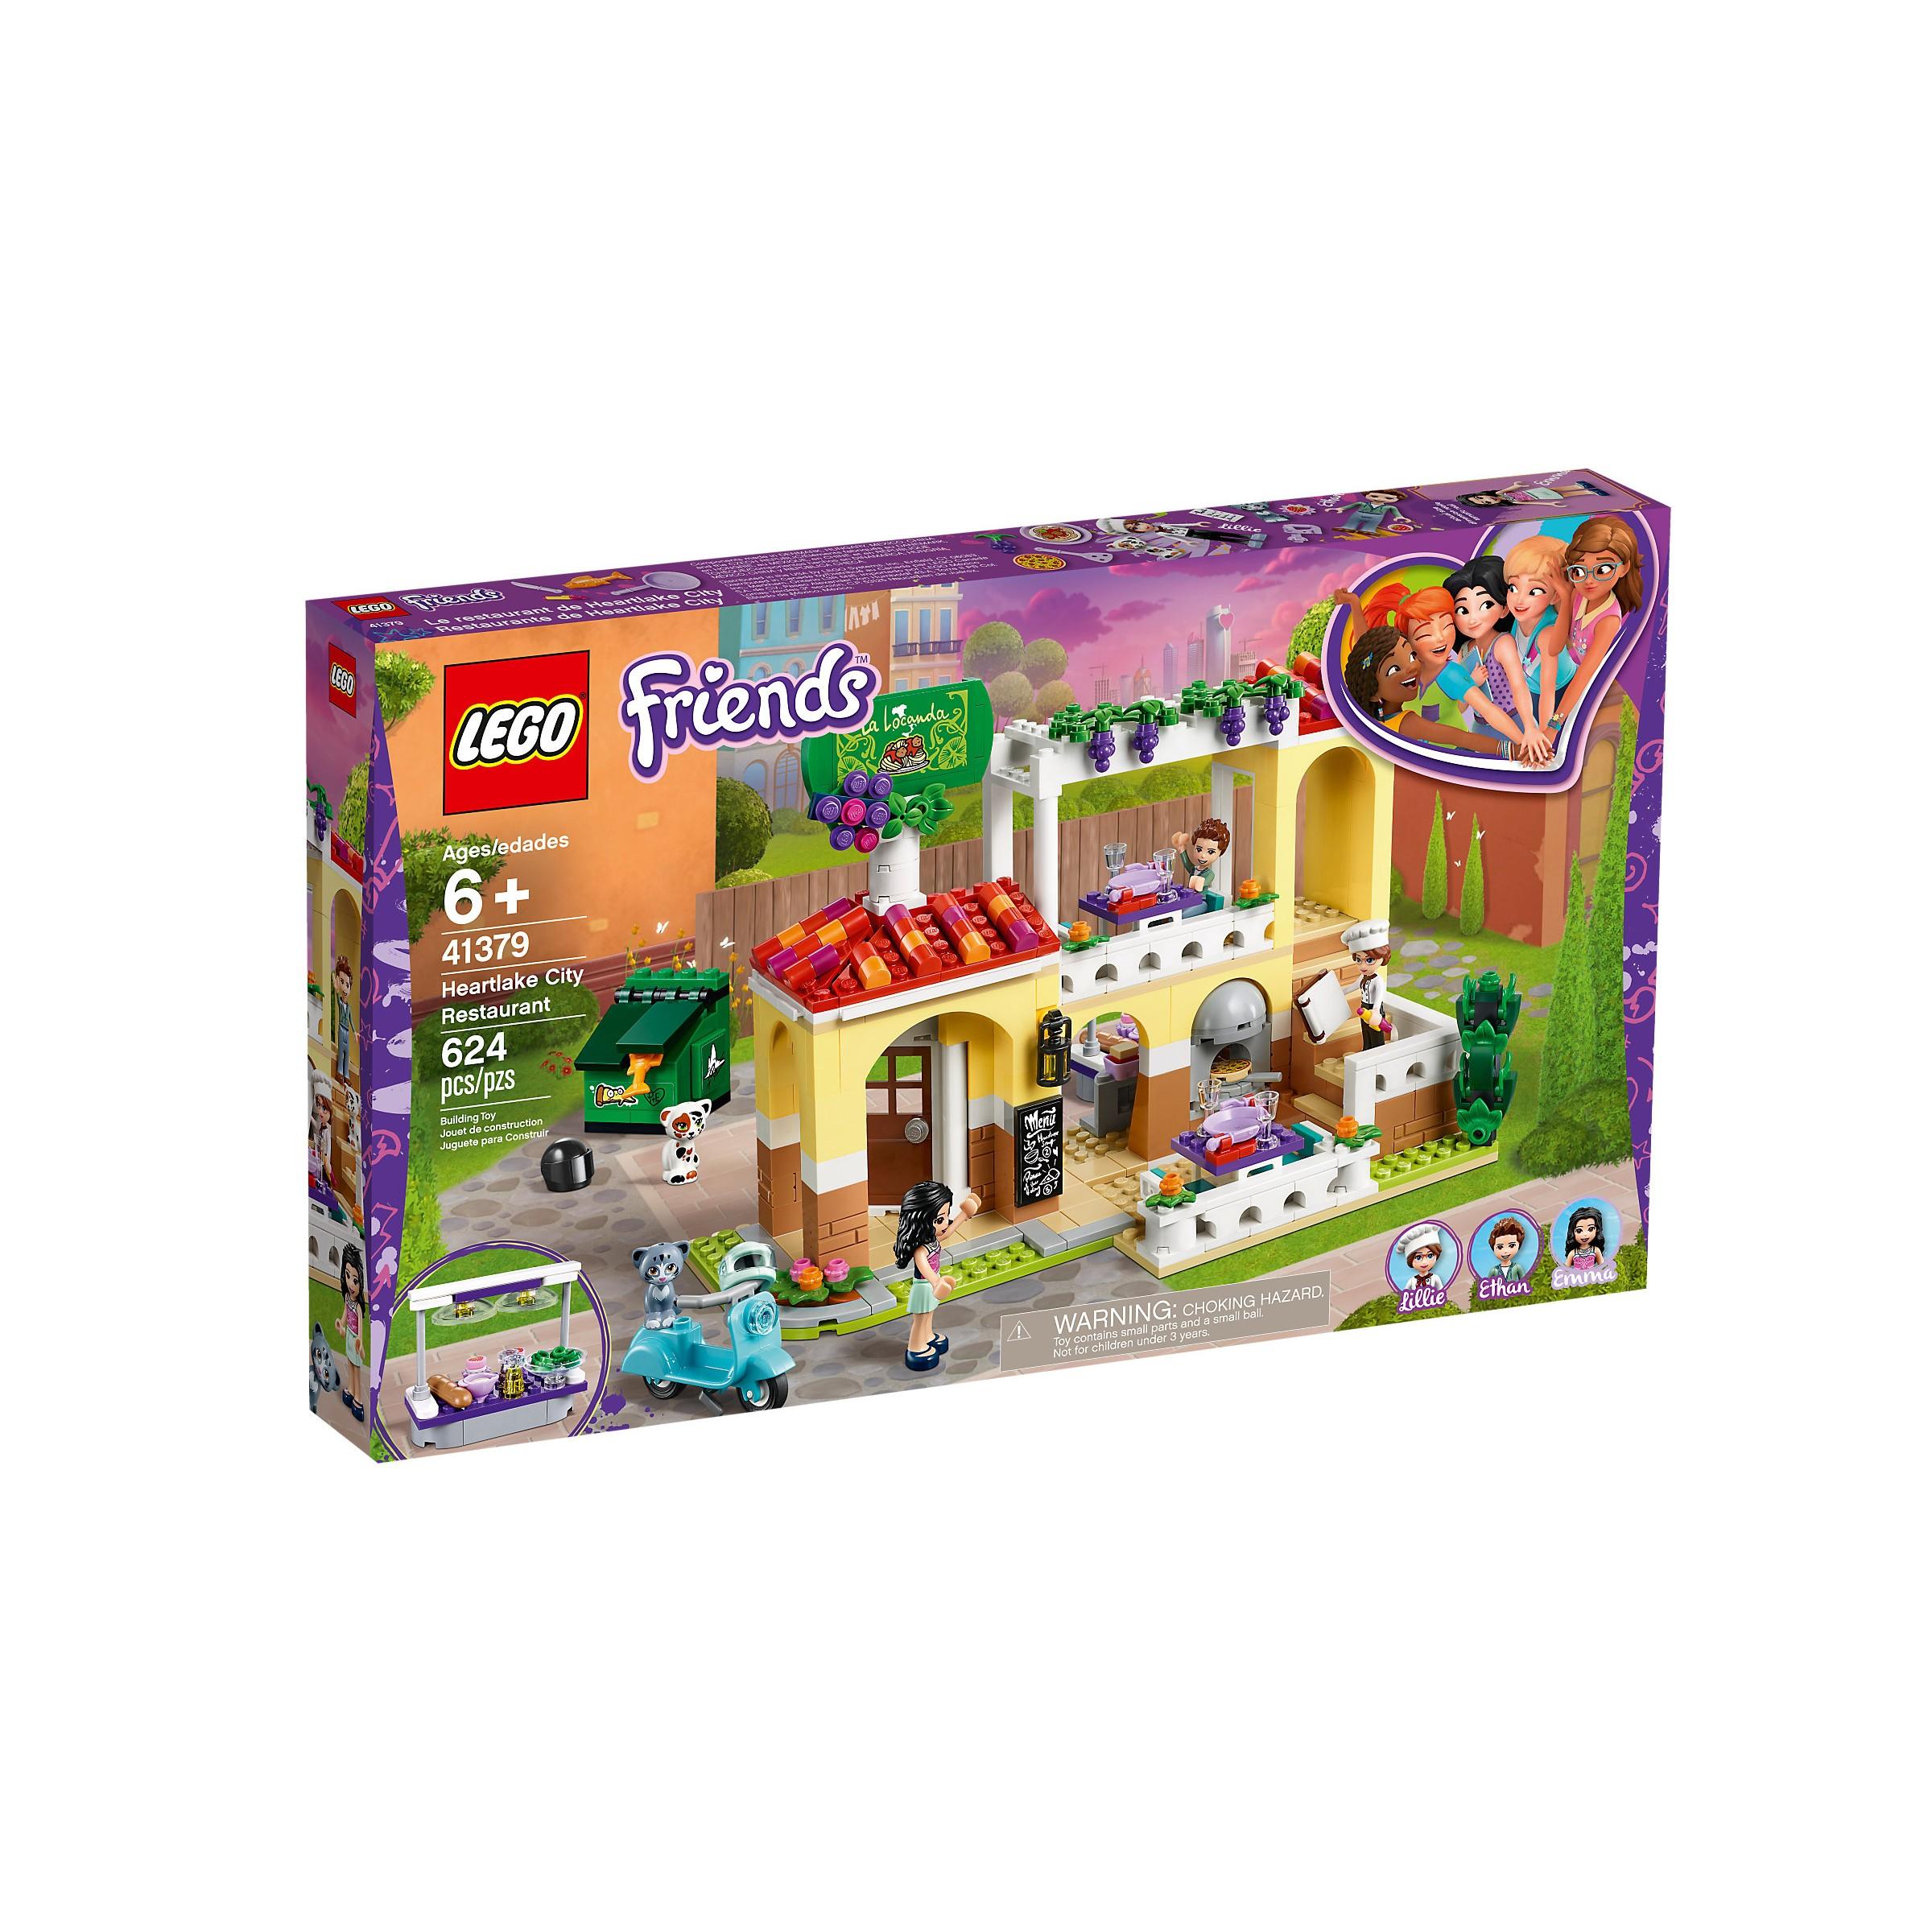 LEGO 41379 Friends Heartlake City Restaurant at Hobby ...